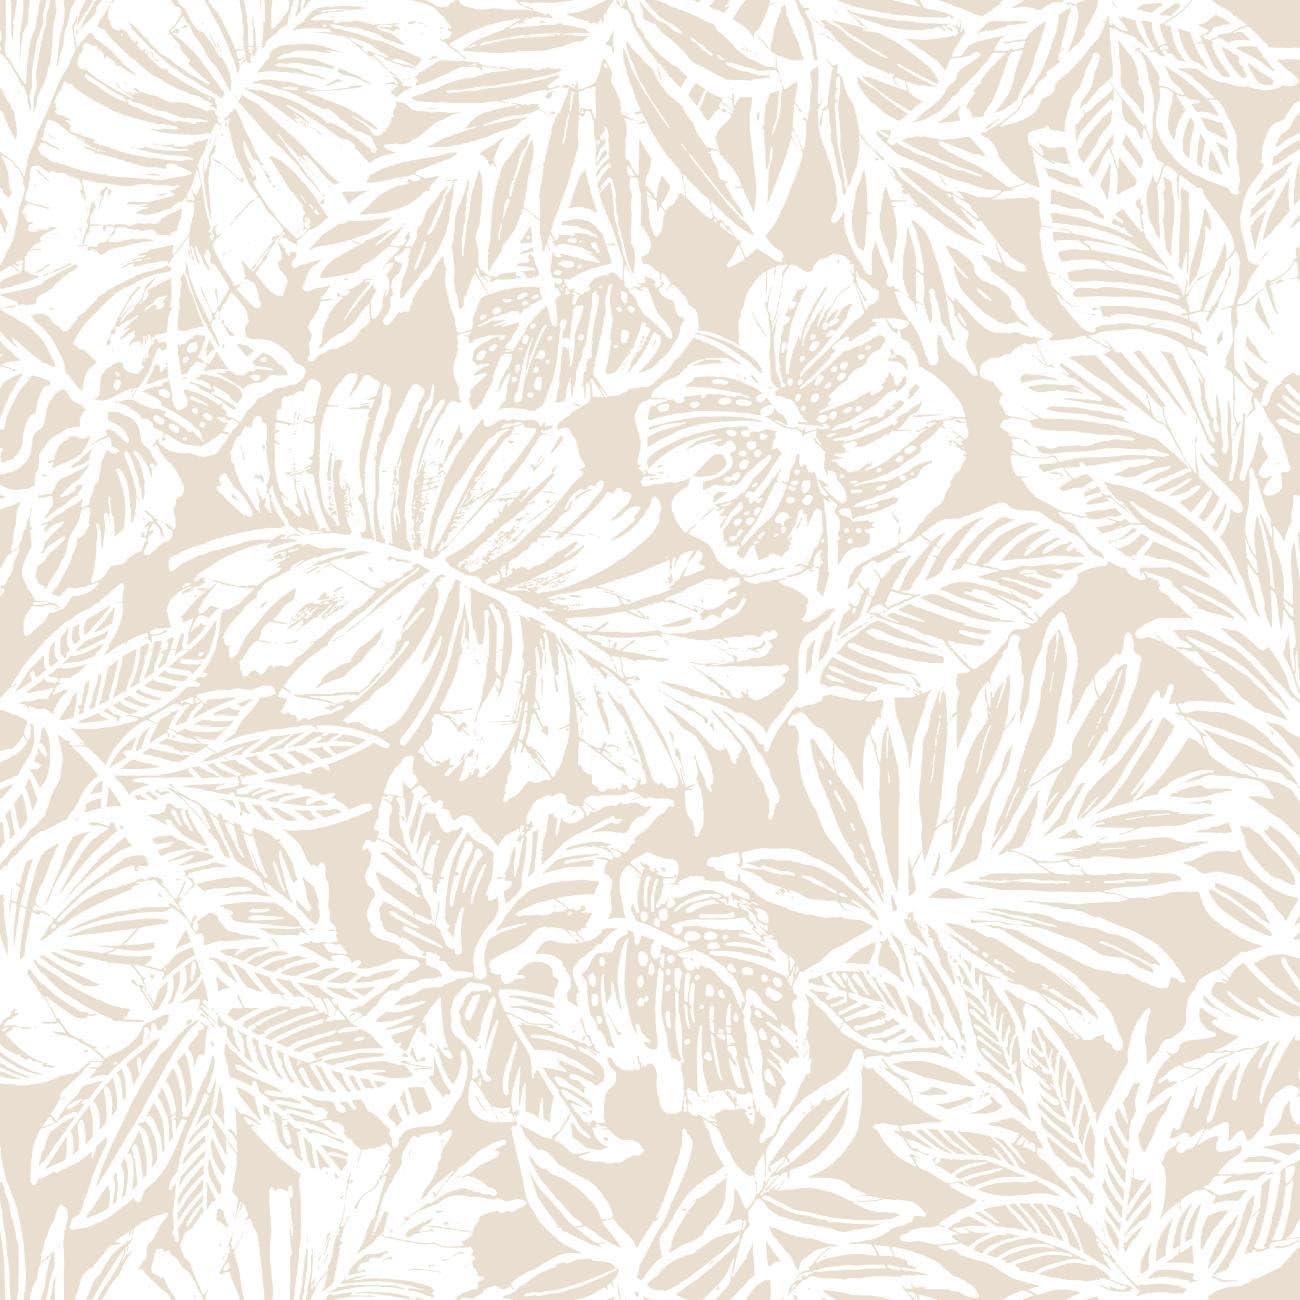 Amazon Com Roommates Tan Tropical Leaf Peel And Stick Wallpaper